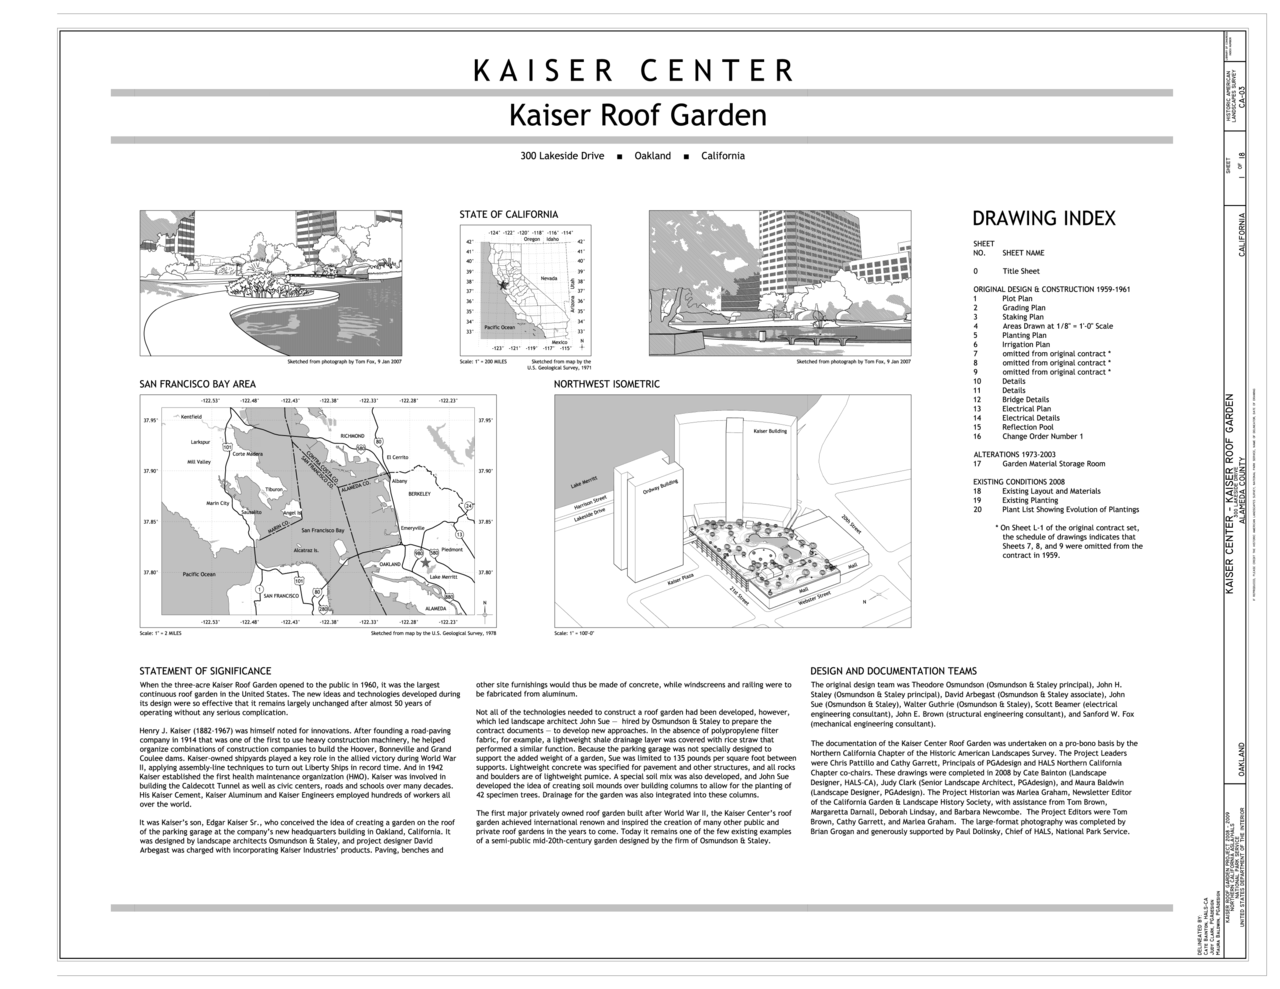 File Kaiser Center Kaiser Roof Garden Title Sheet